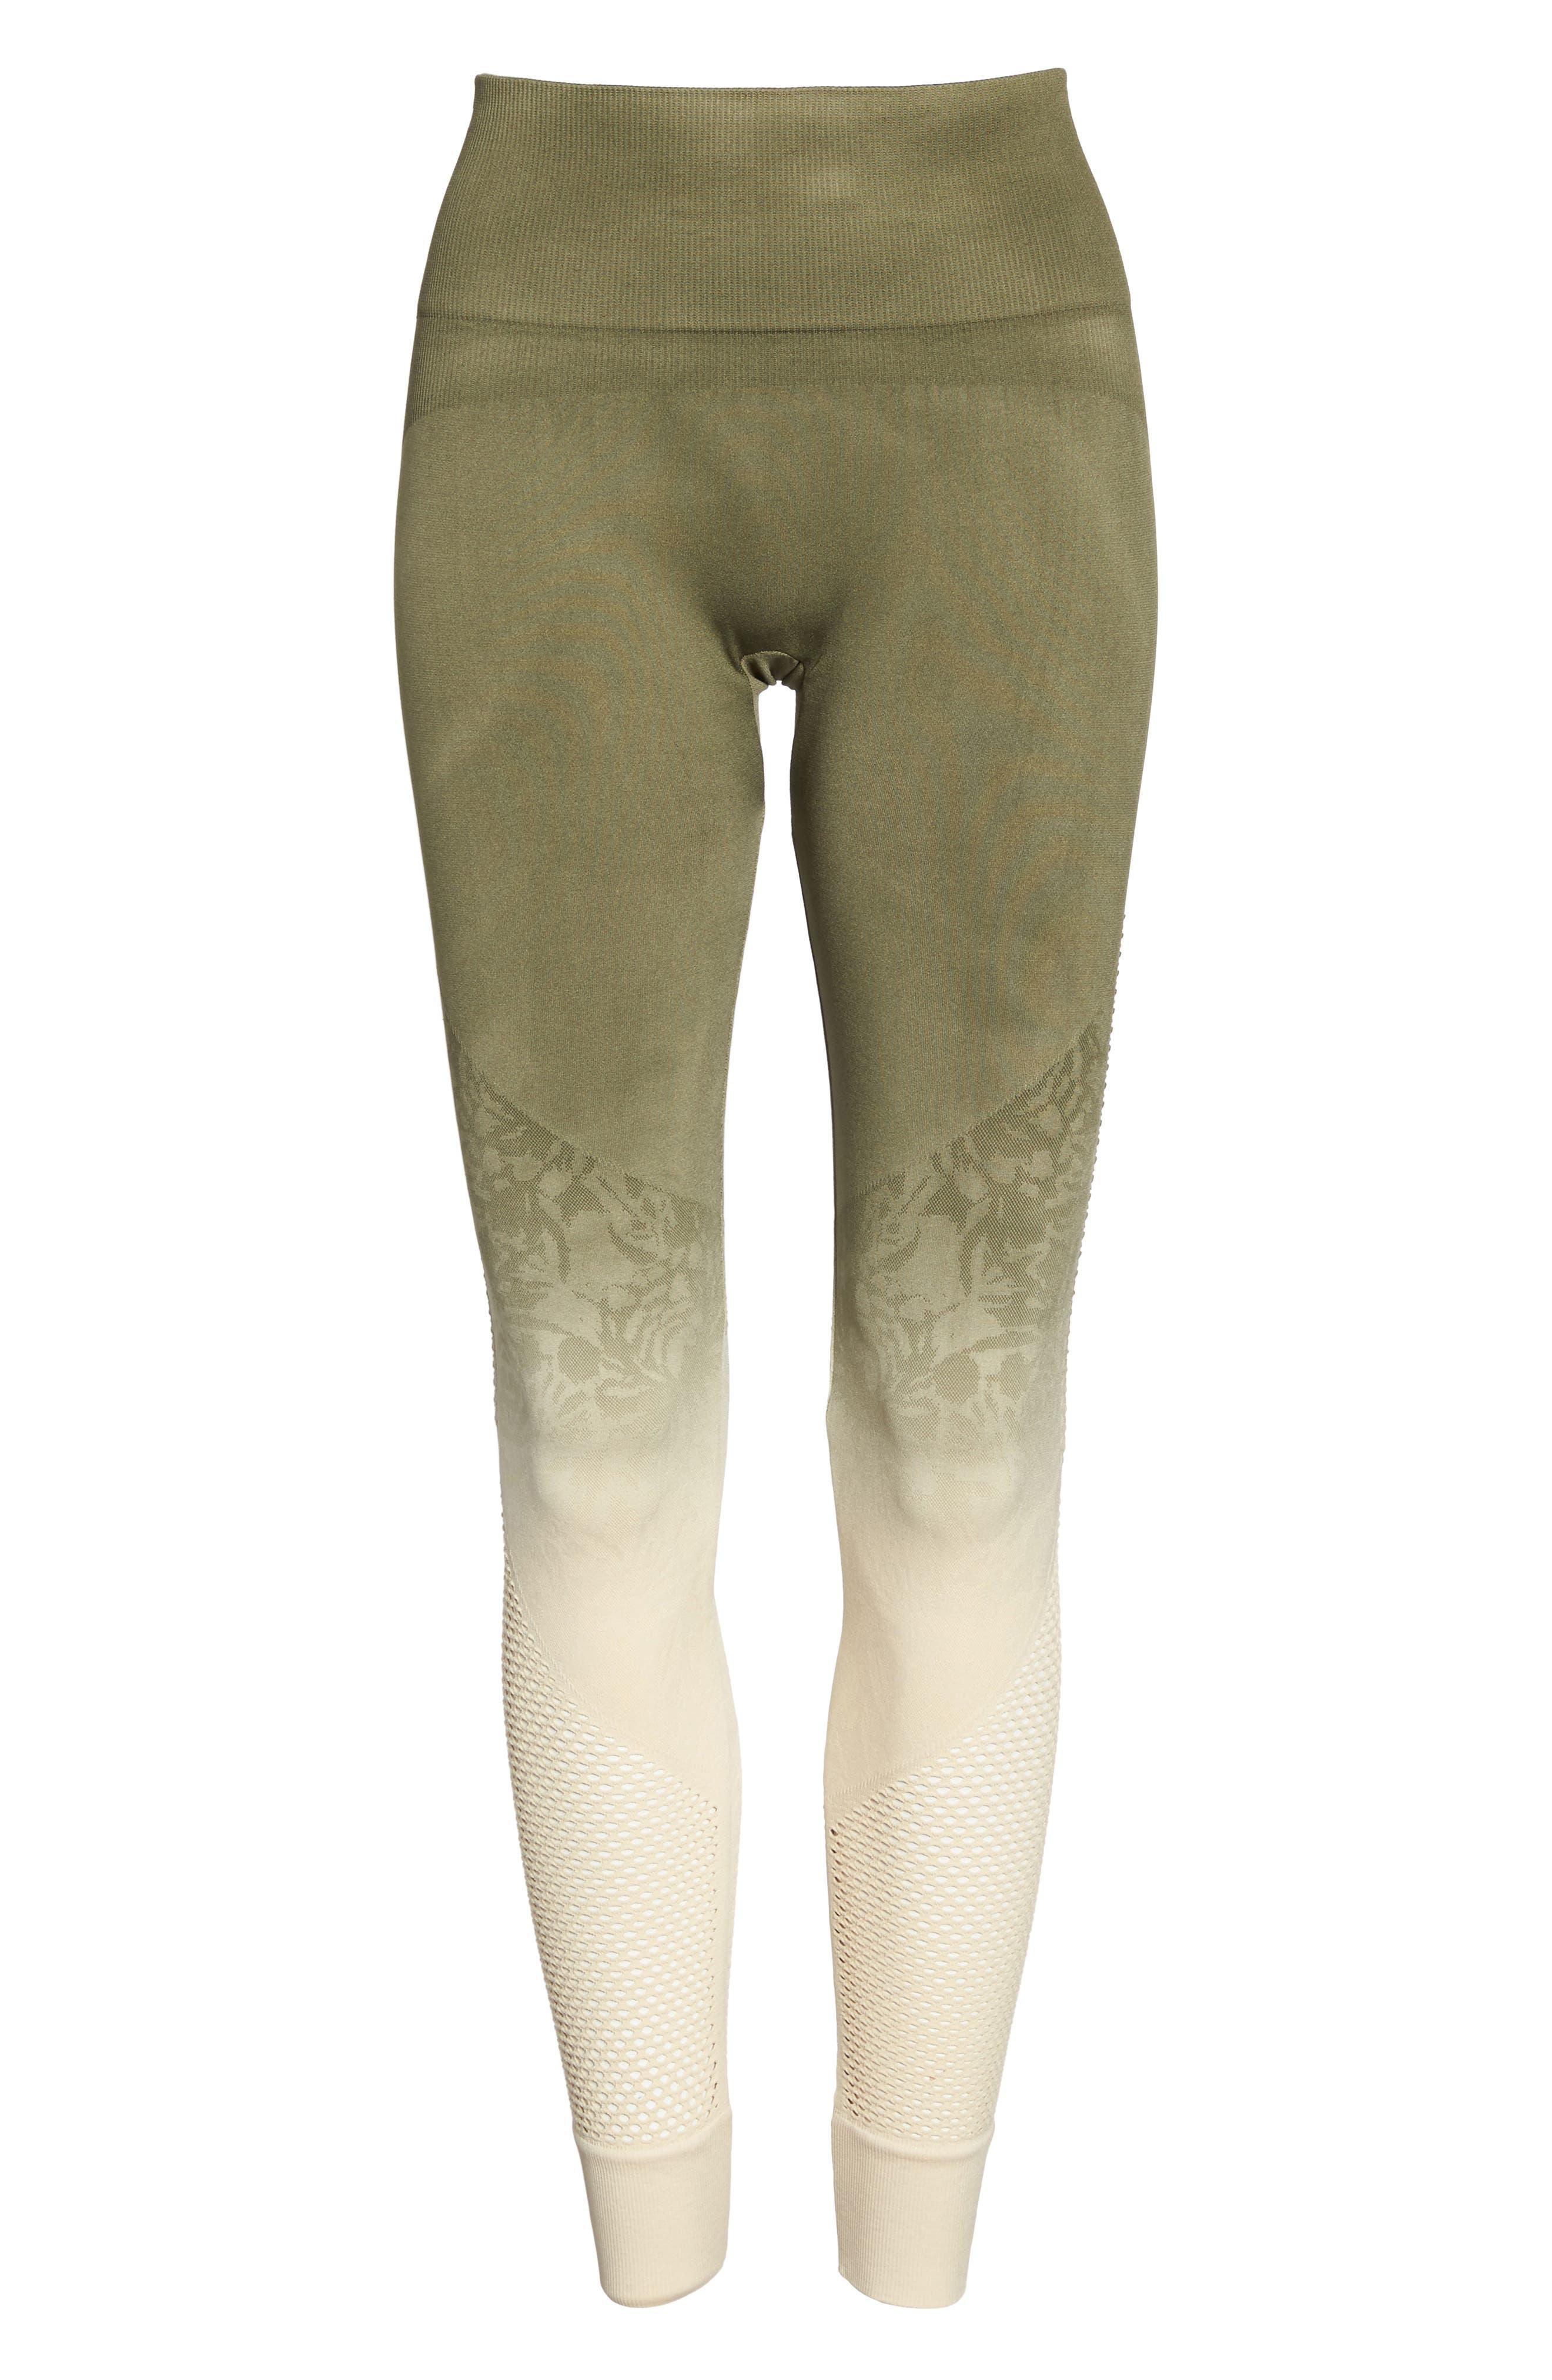 Formation High Waist Leggings,                             Alternate thumbnail 7, color,                             Tapioca W/ Deep Lichen Green